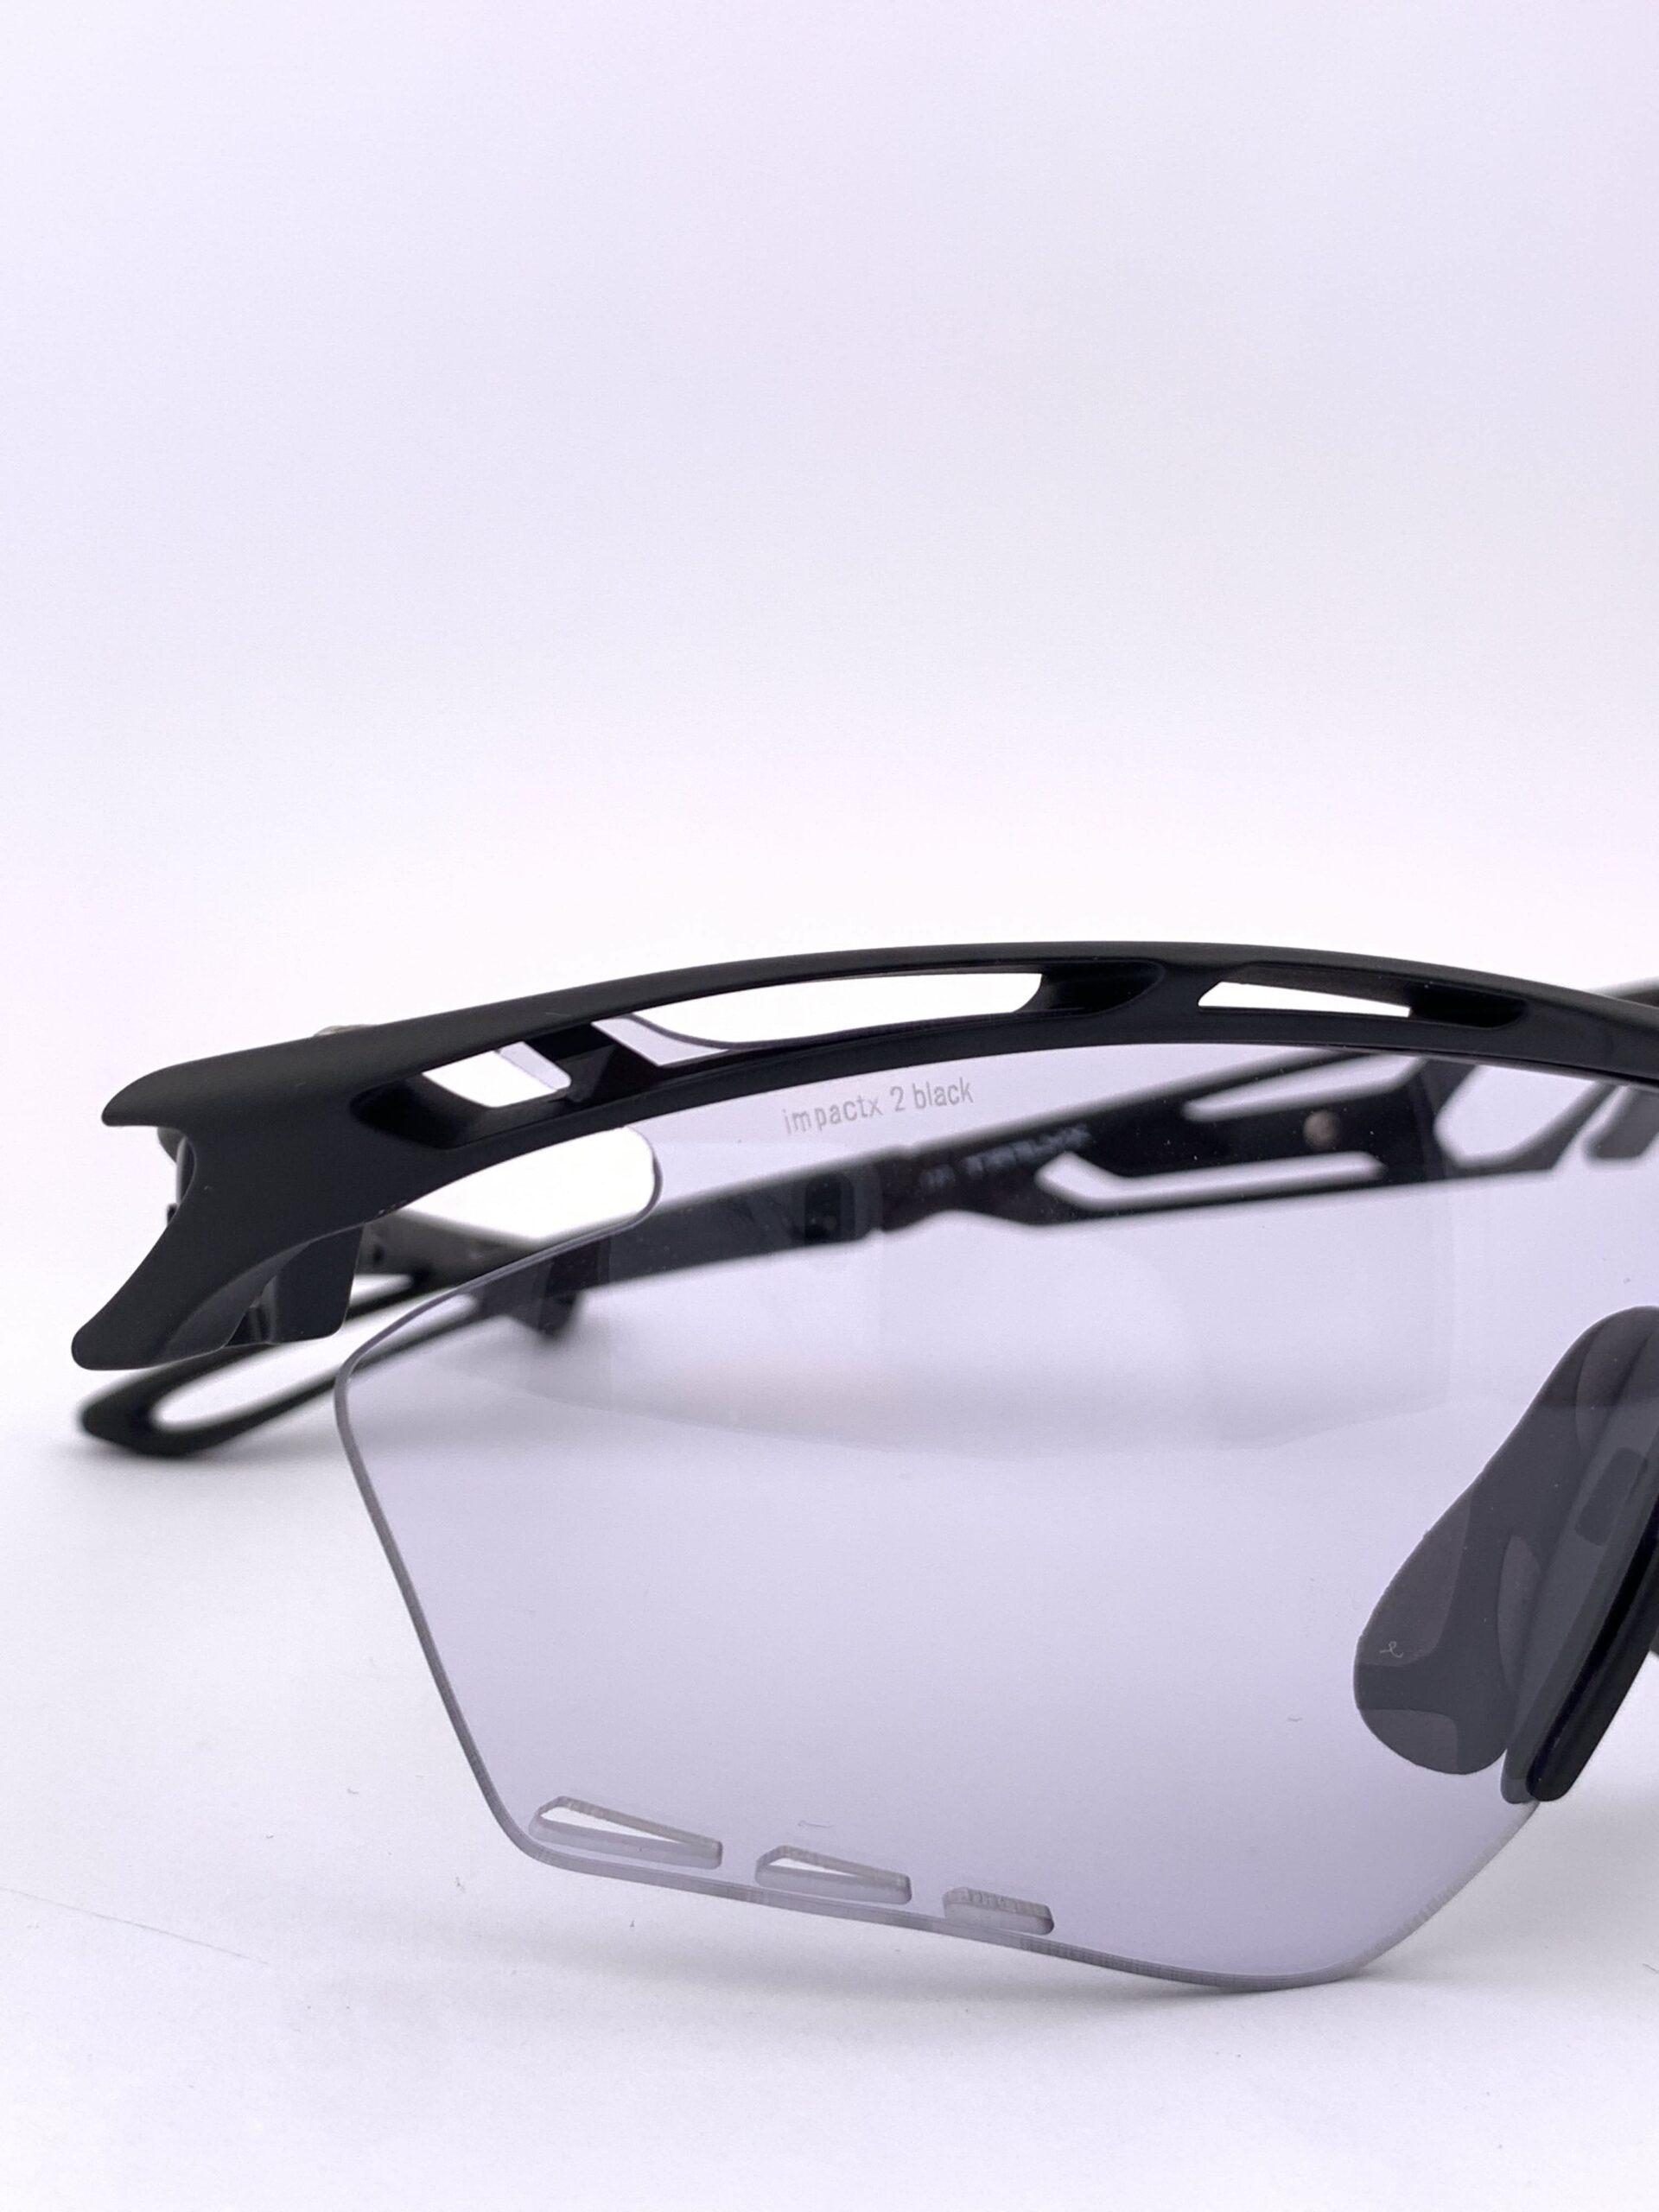 Cyklistické okuliare Tralyx čierne detail